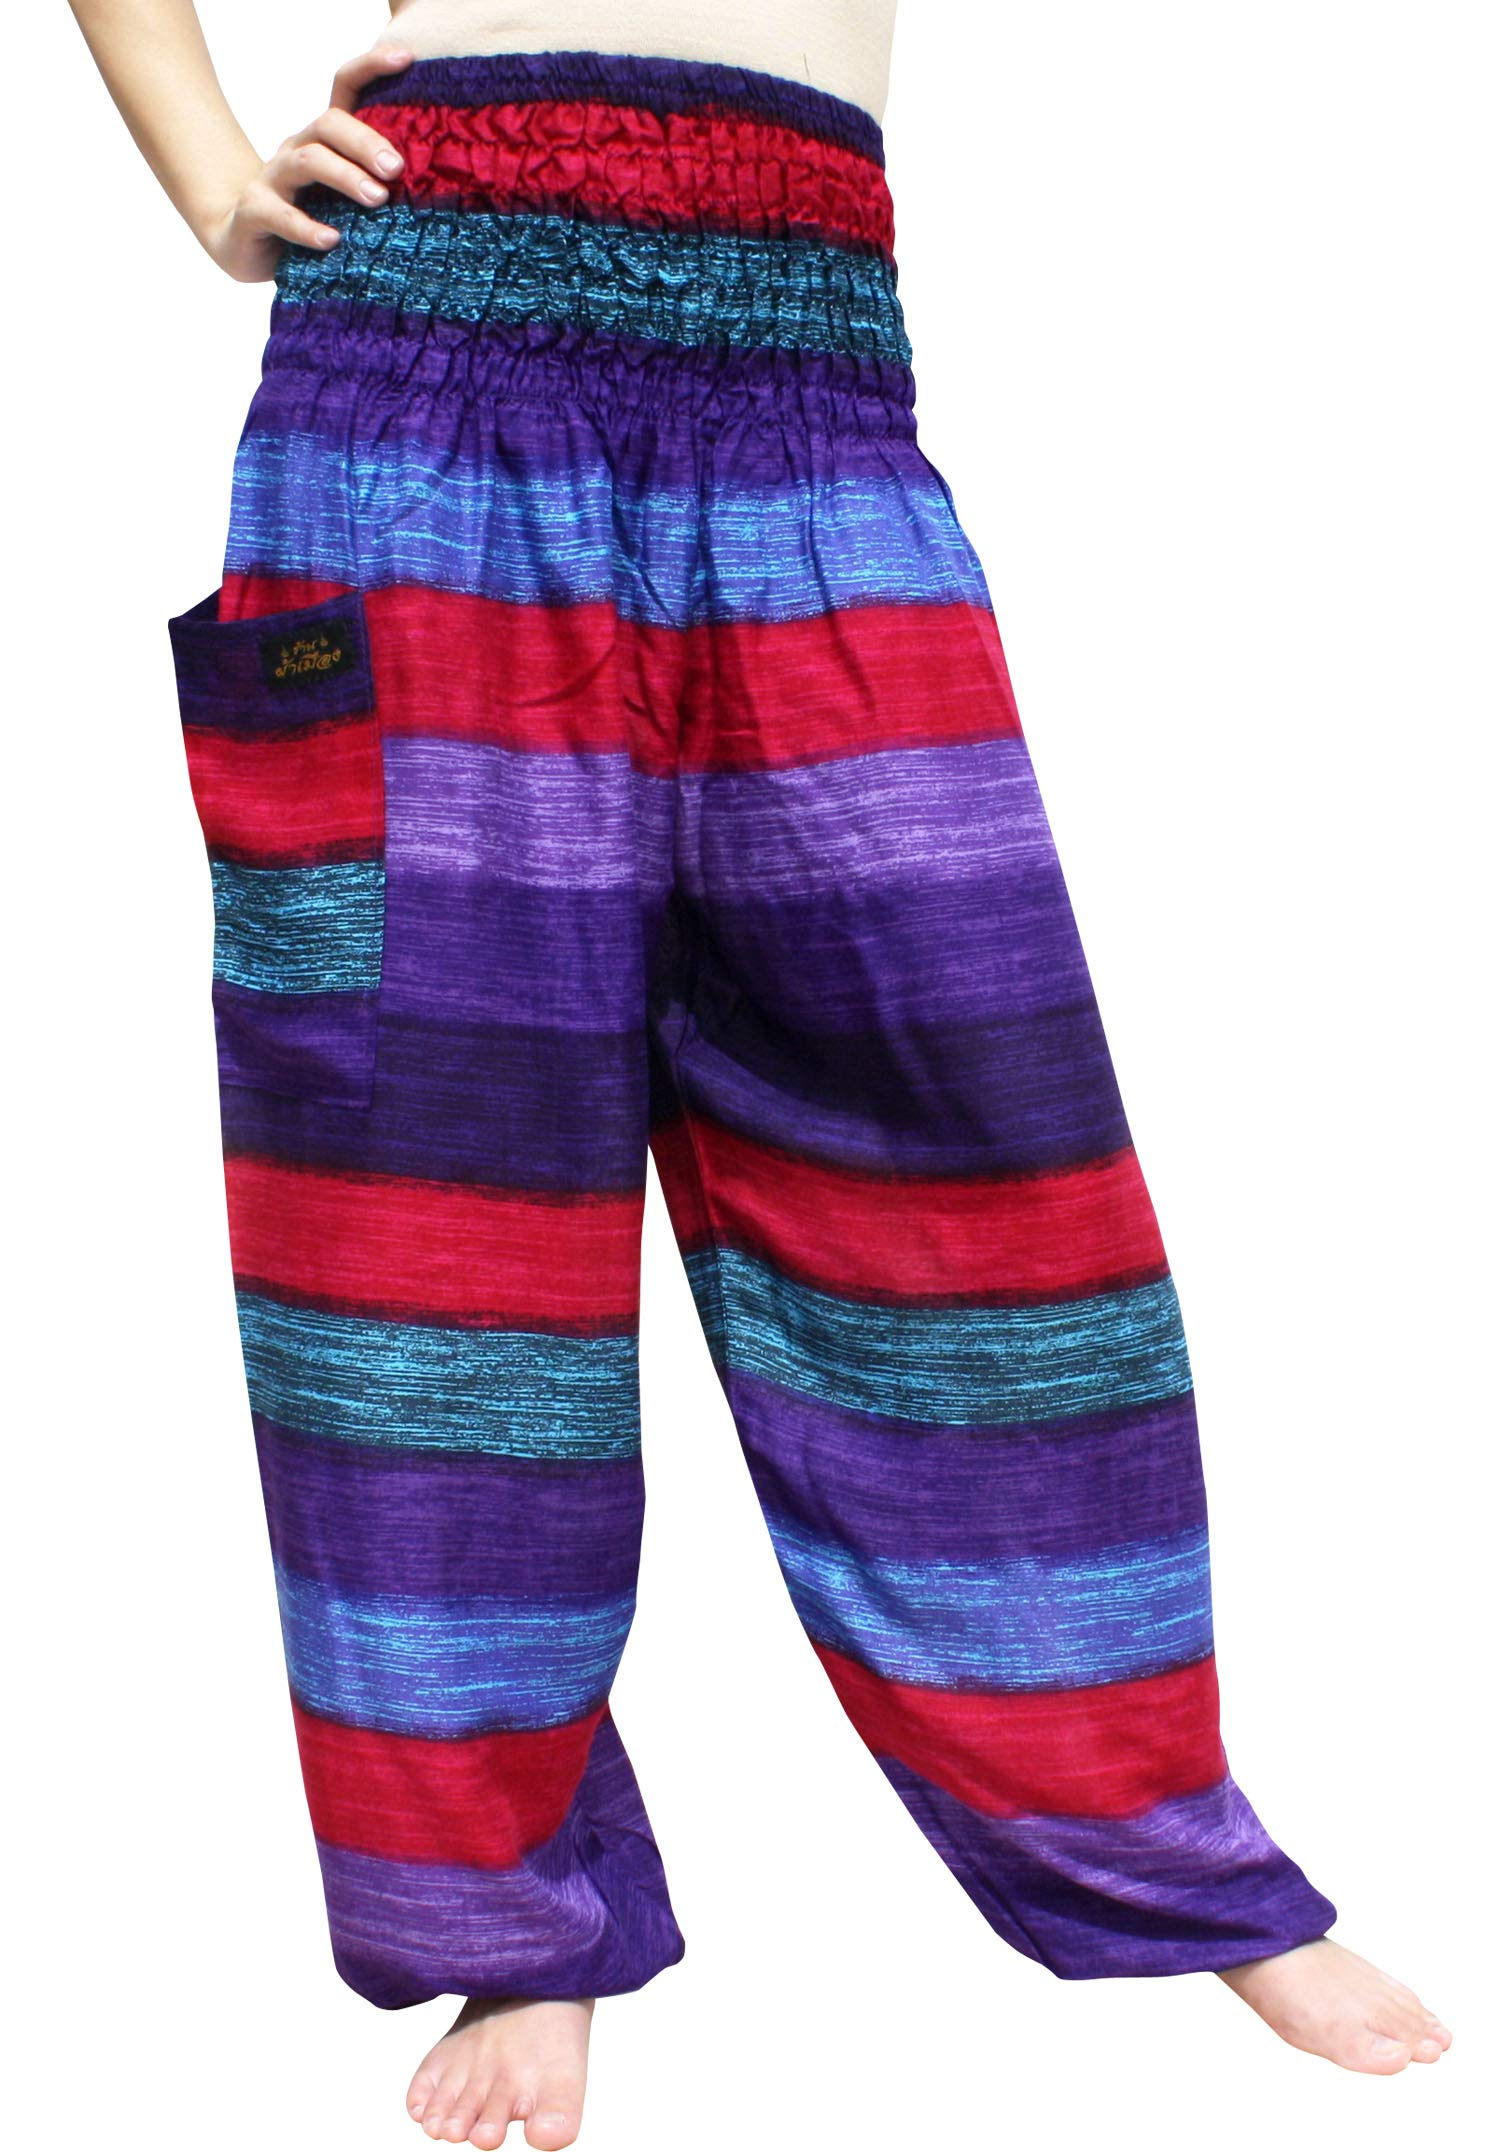 RaanPahMuang Brand Smock Waist Rayon Mixed Art Harem Baggy Aladdin Pants, Large, Rainbow Stripes - Pink Purple by RaanPahMuang